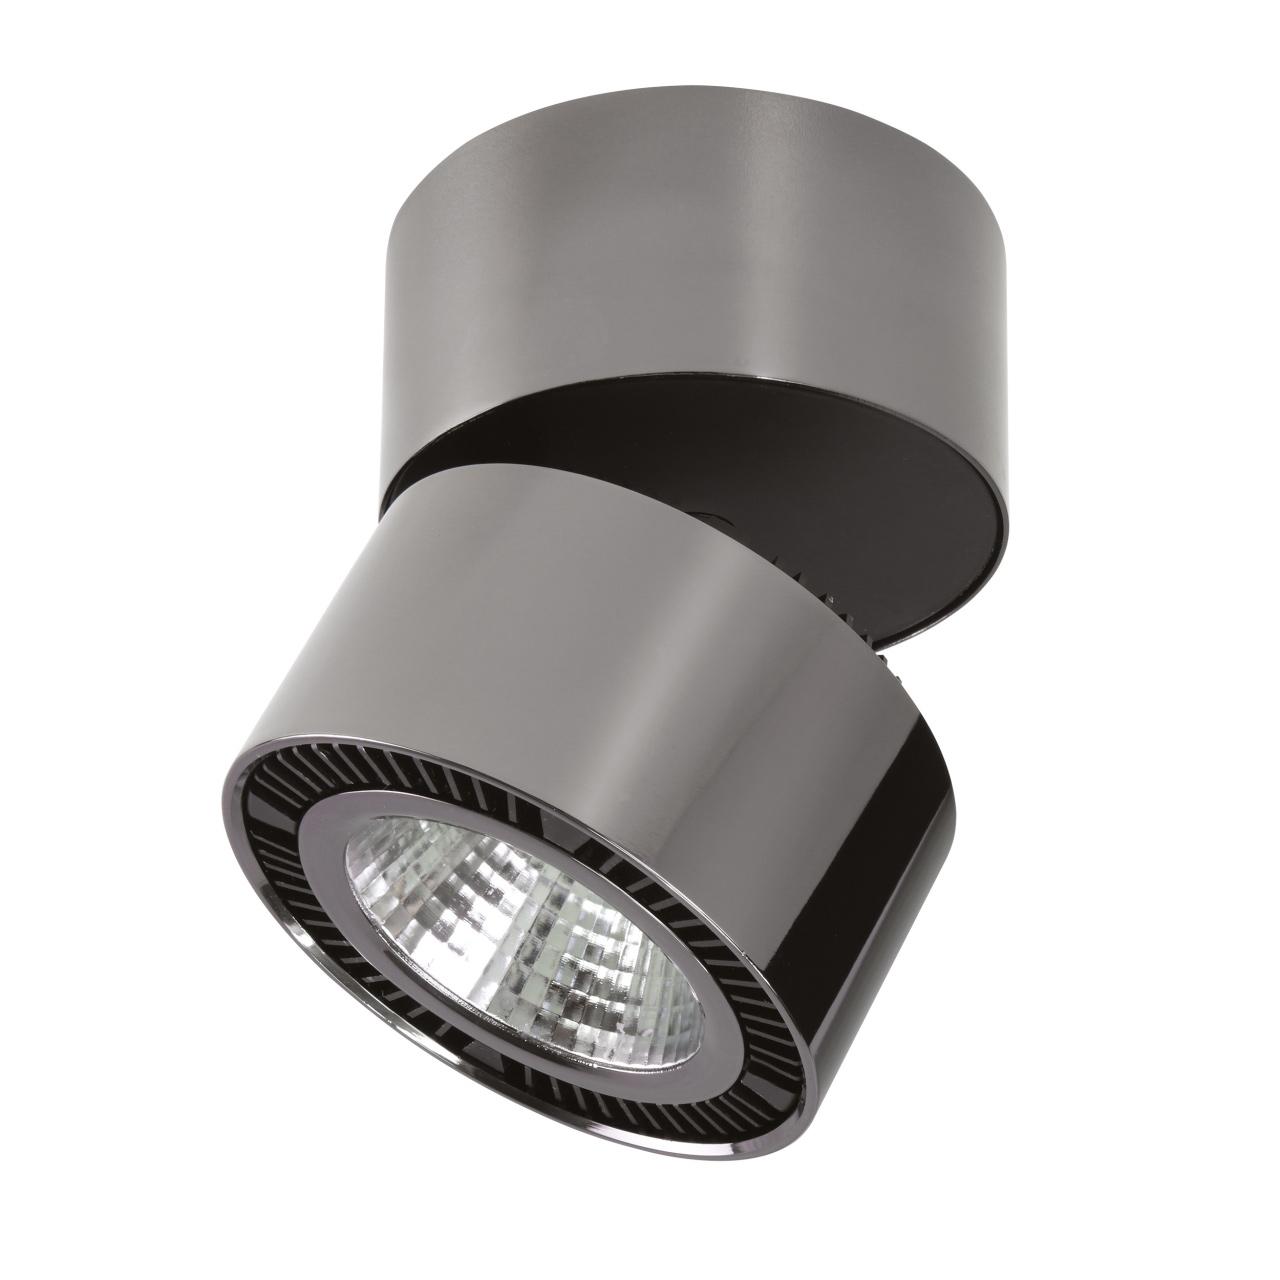 Светильник Forte Muro LED 26W 1950LM 30G черный хром 4000K Lightstar 214838